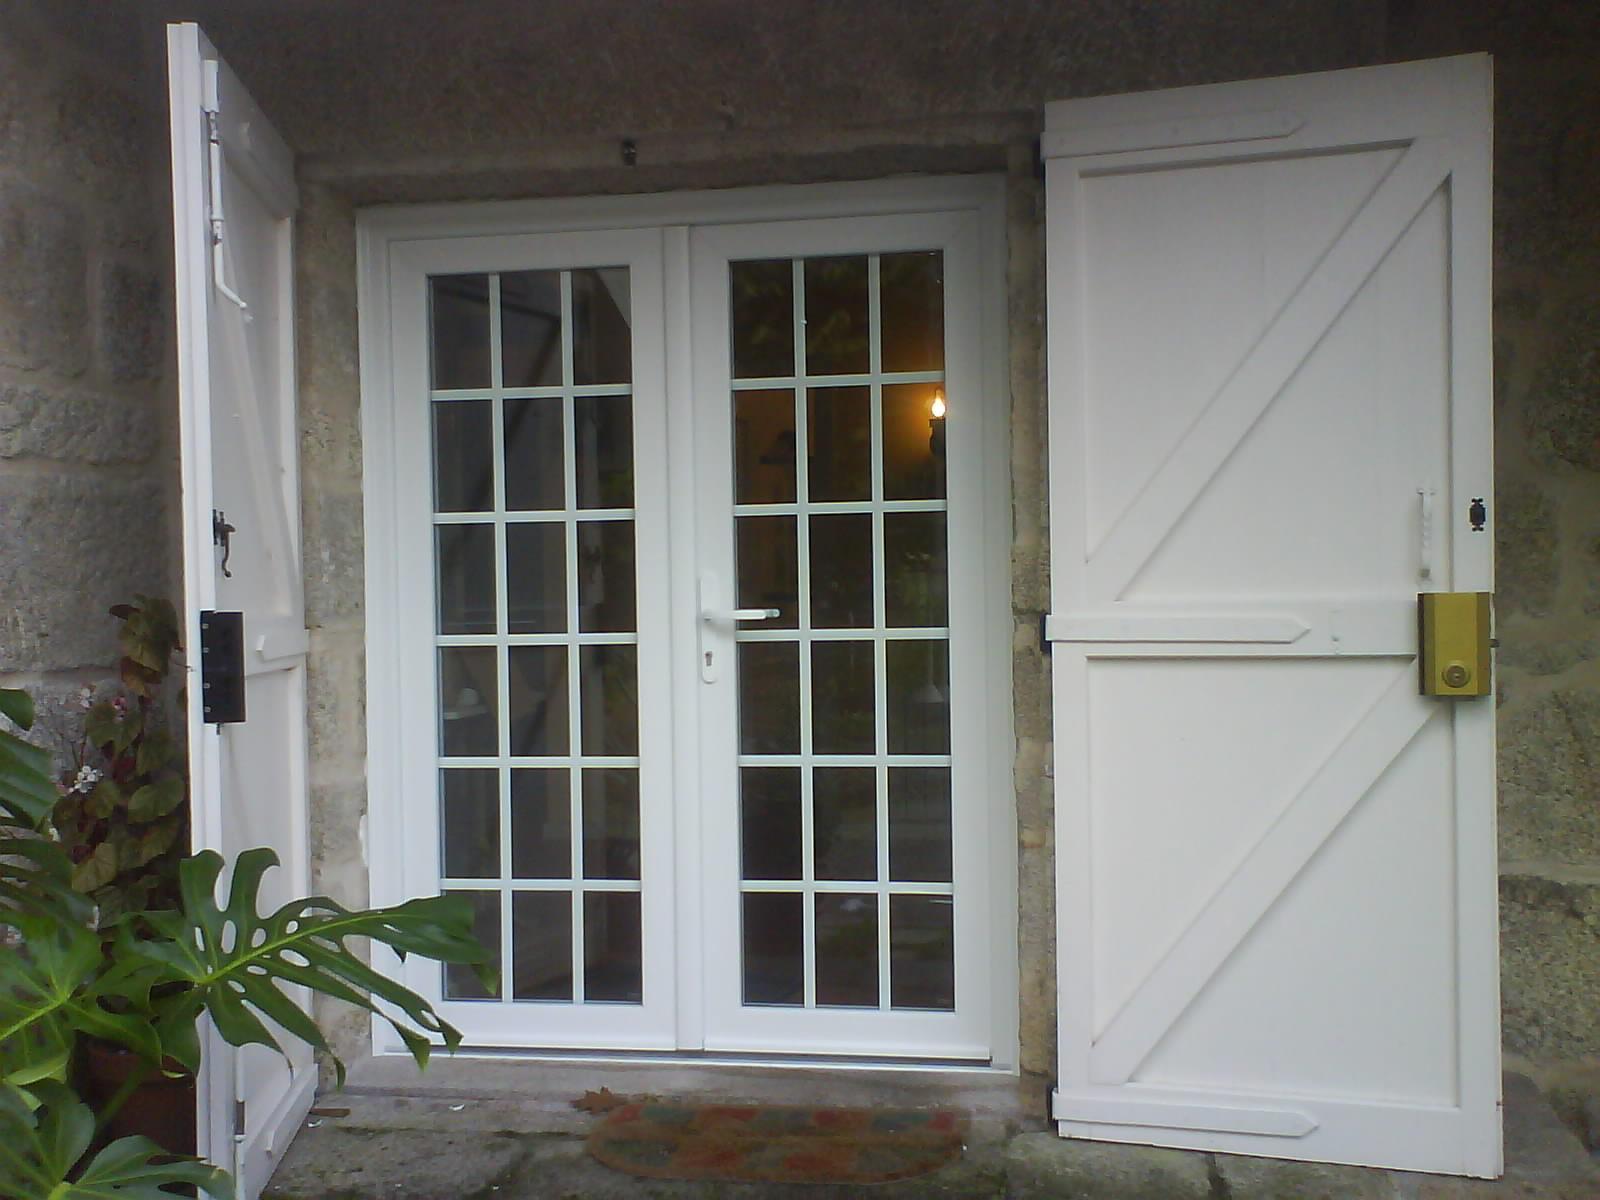 Puerta de entrada acristalada con contras exteriores de madera